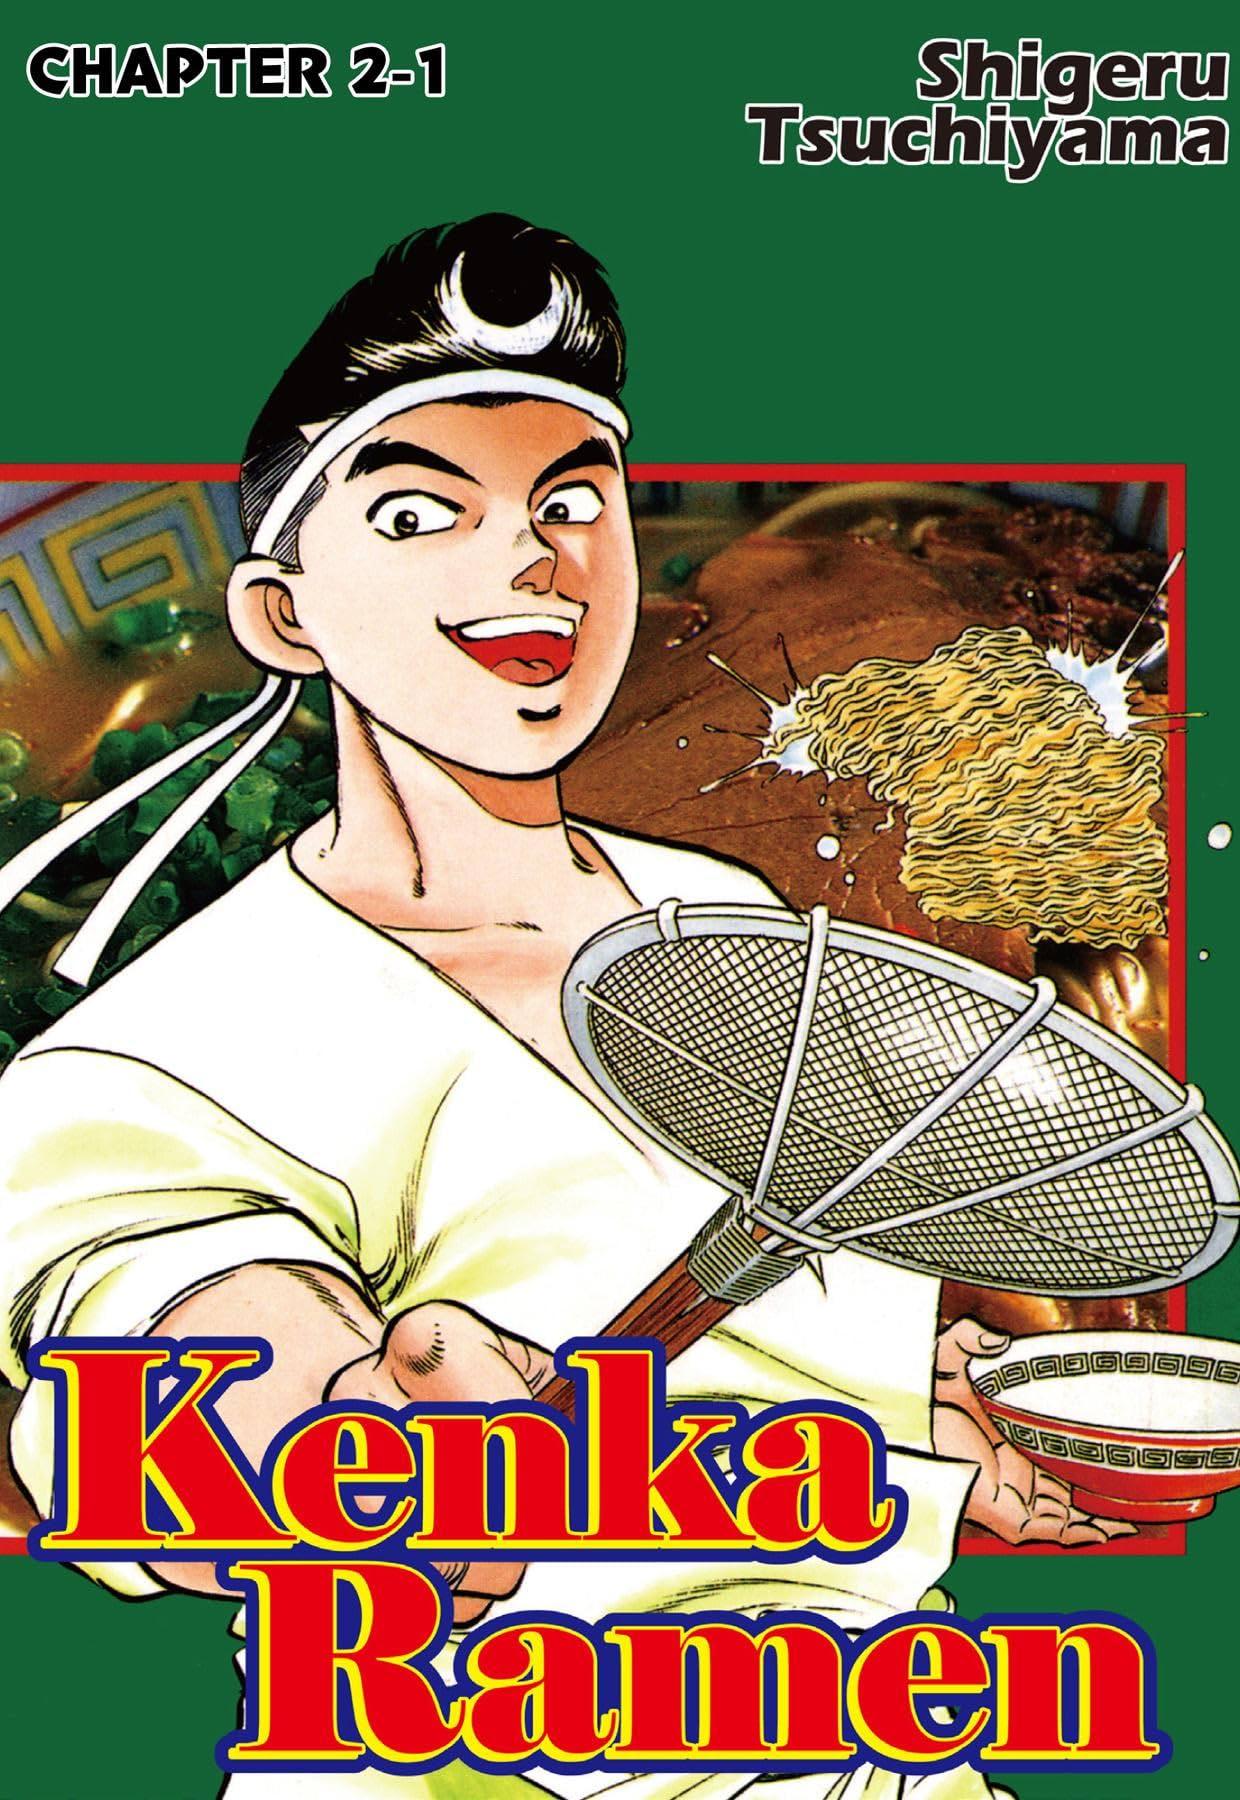 KENKA RAMEN #10